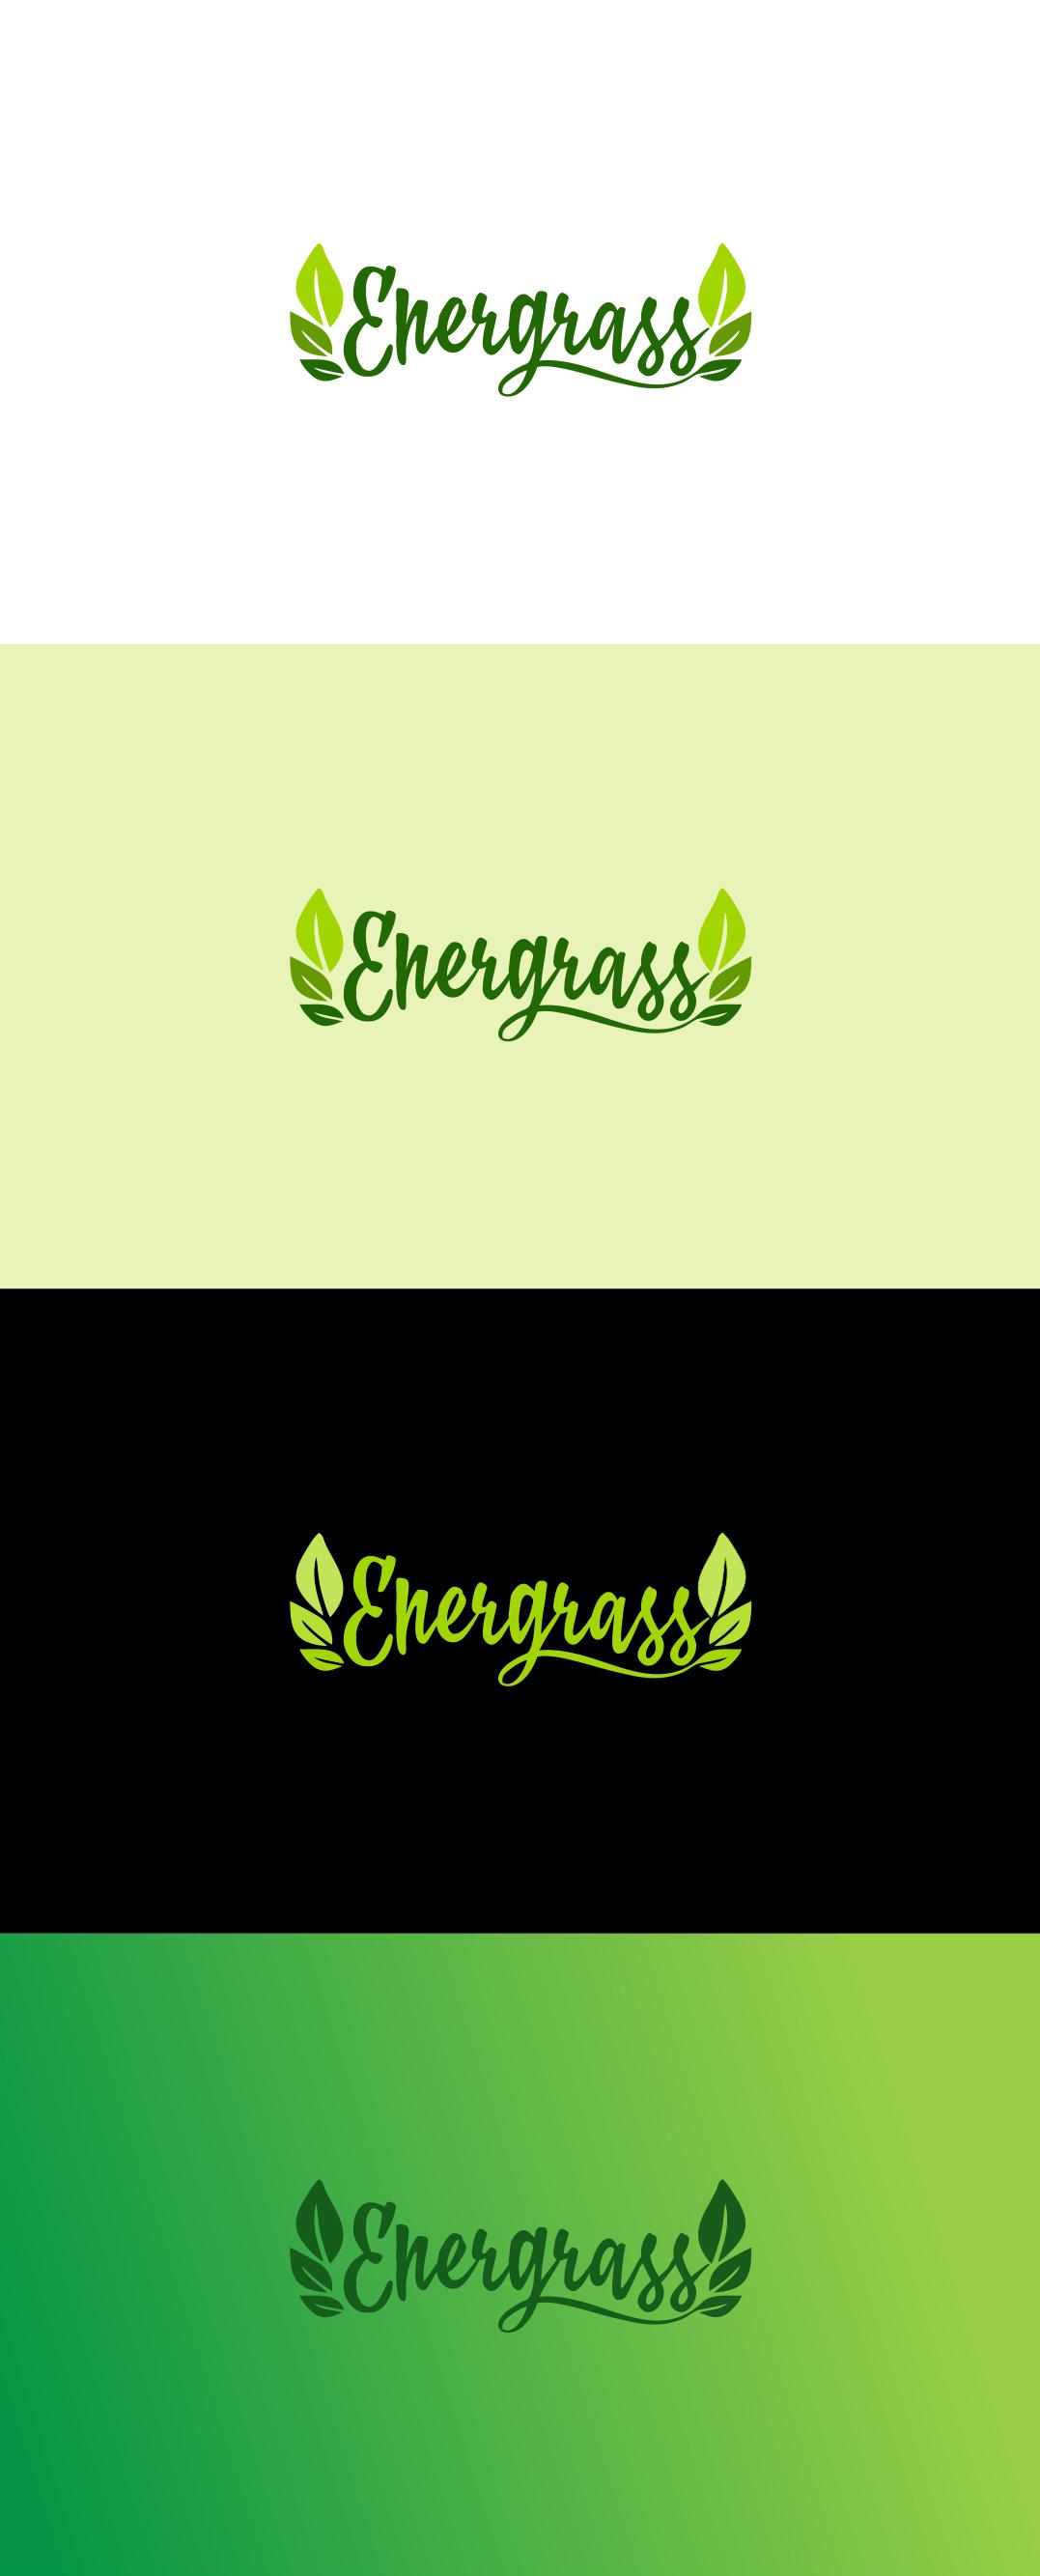 Графический дизайнер для создания логотипа Energrass. фото f_1385f89848b9d4b3.jpg